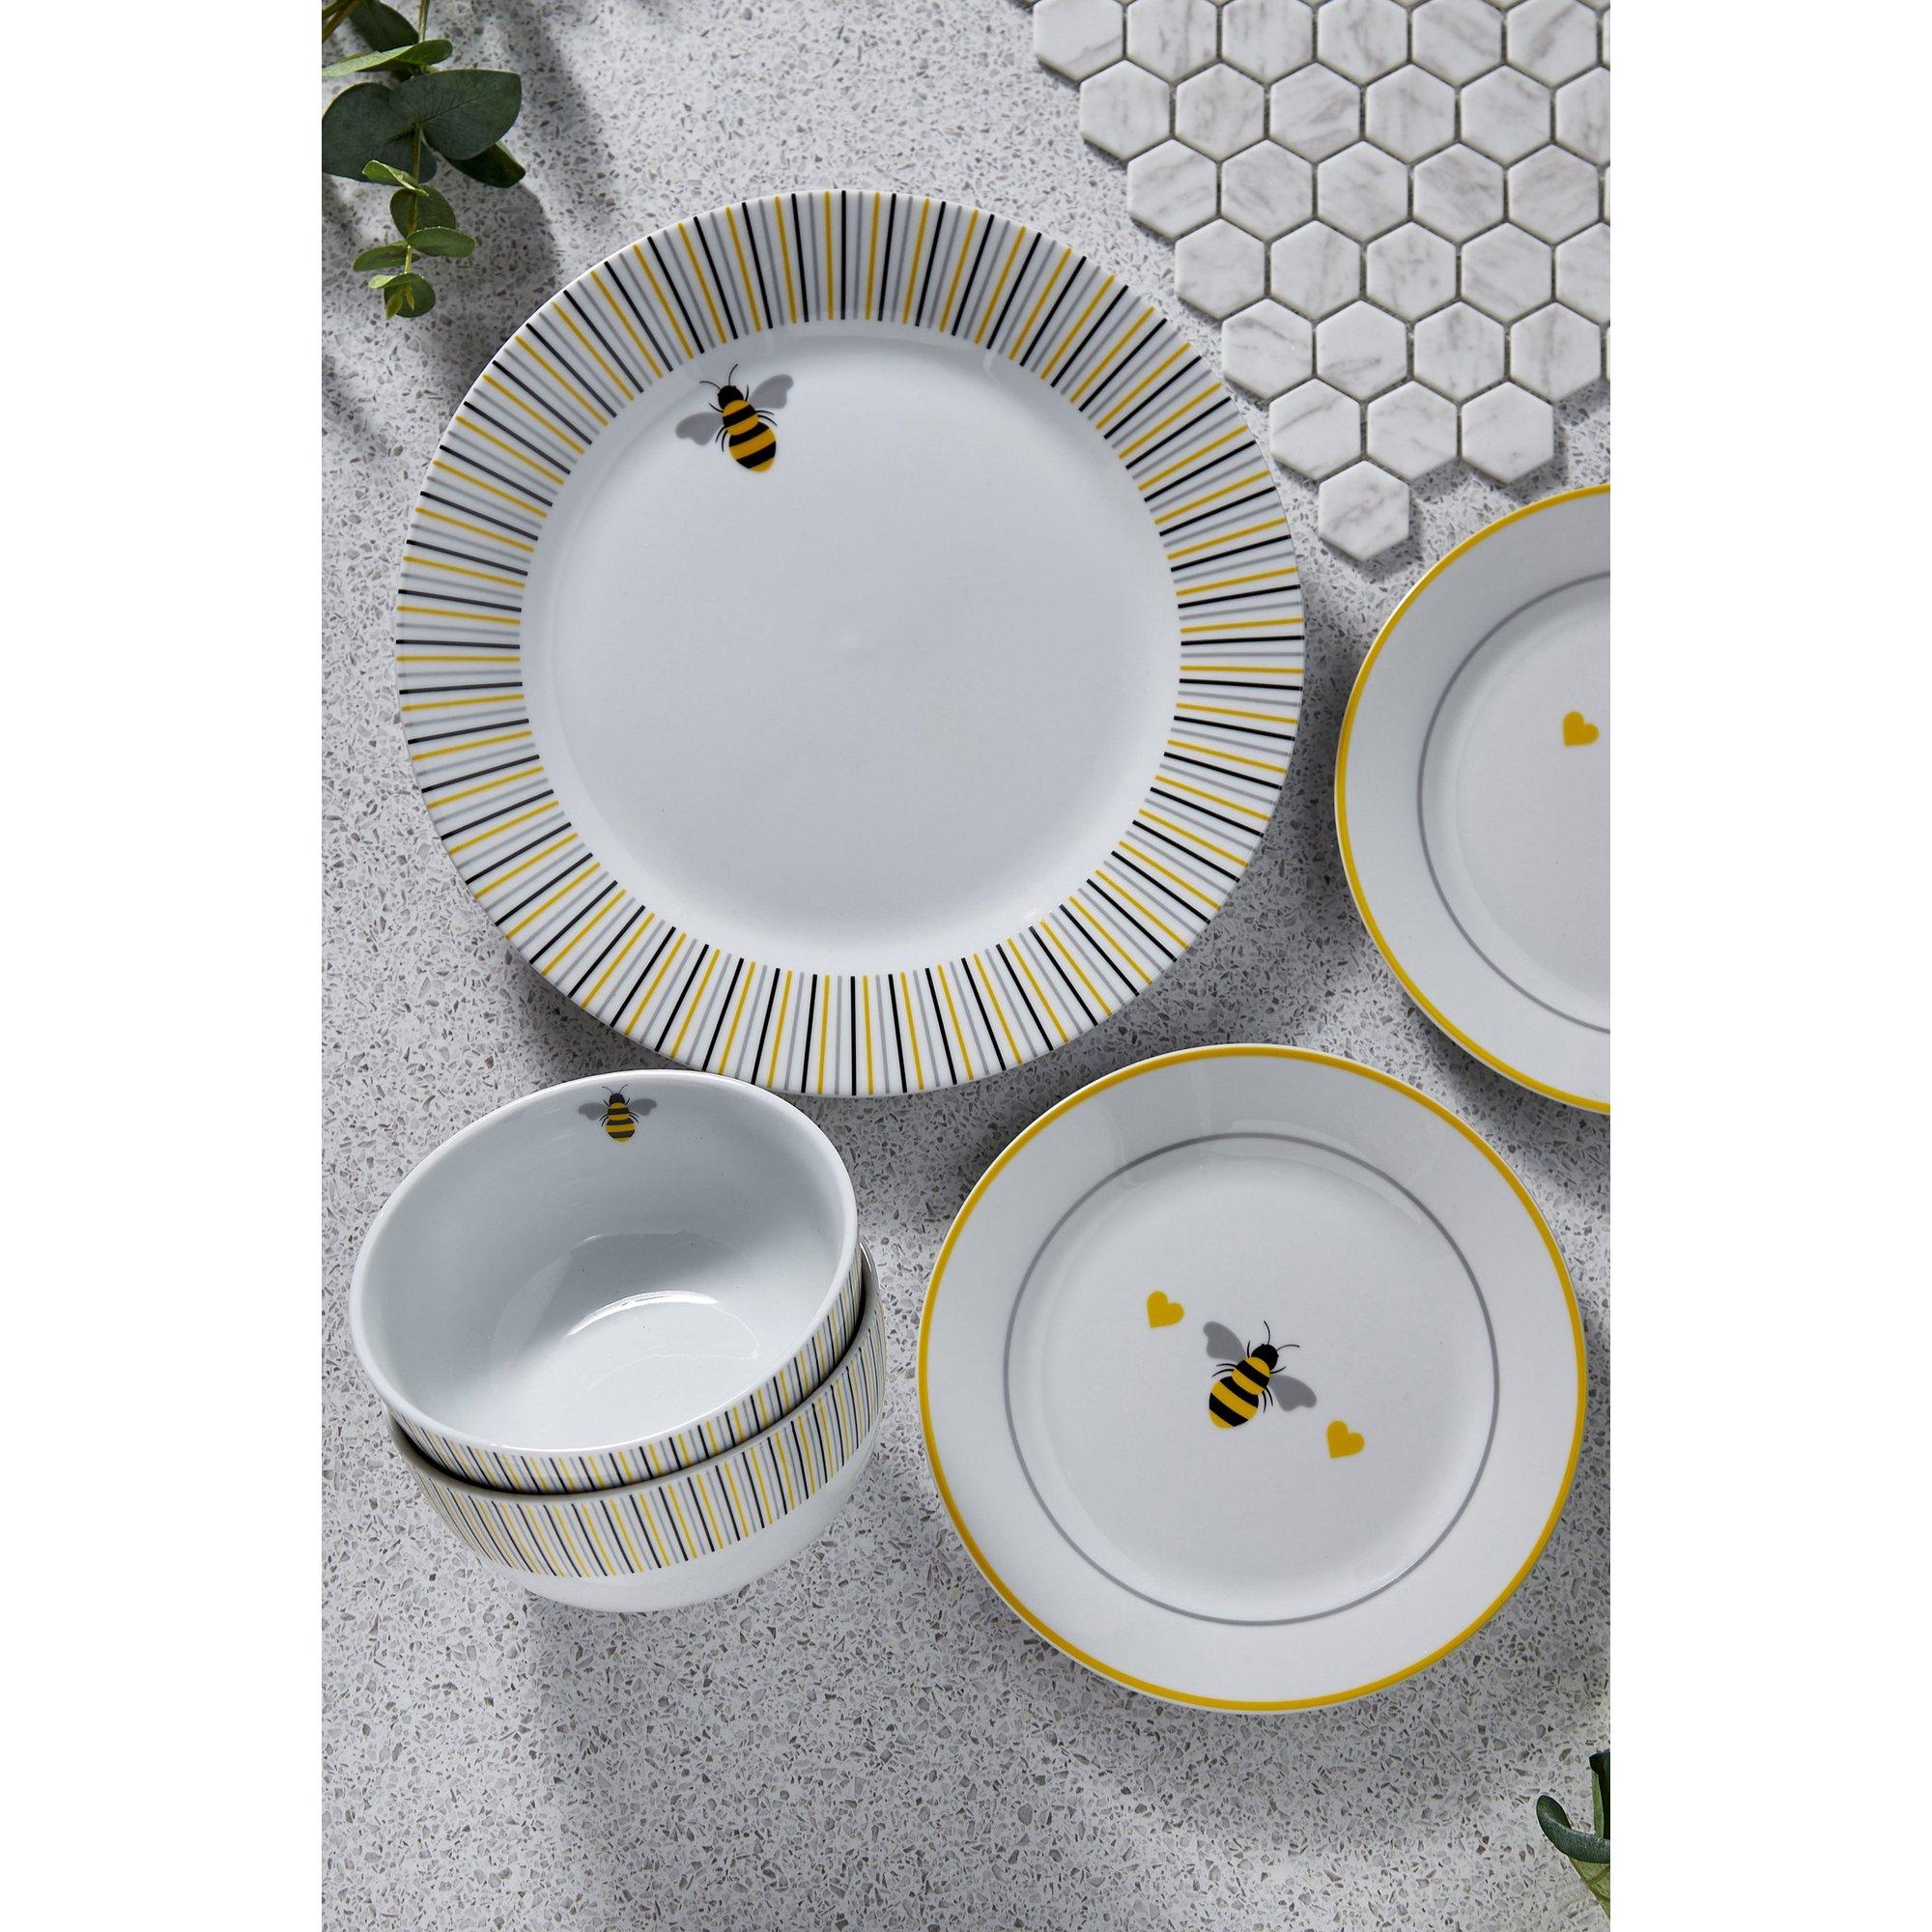 Image of 12 Piece Porcelain Bee Dinner Set